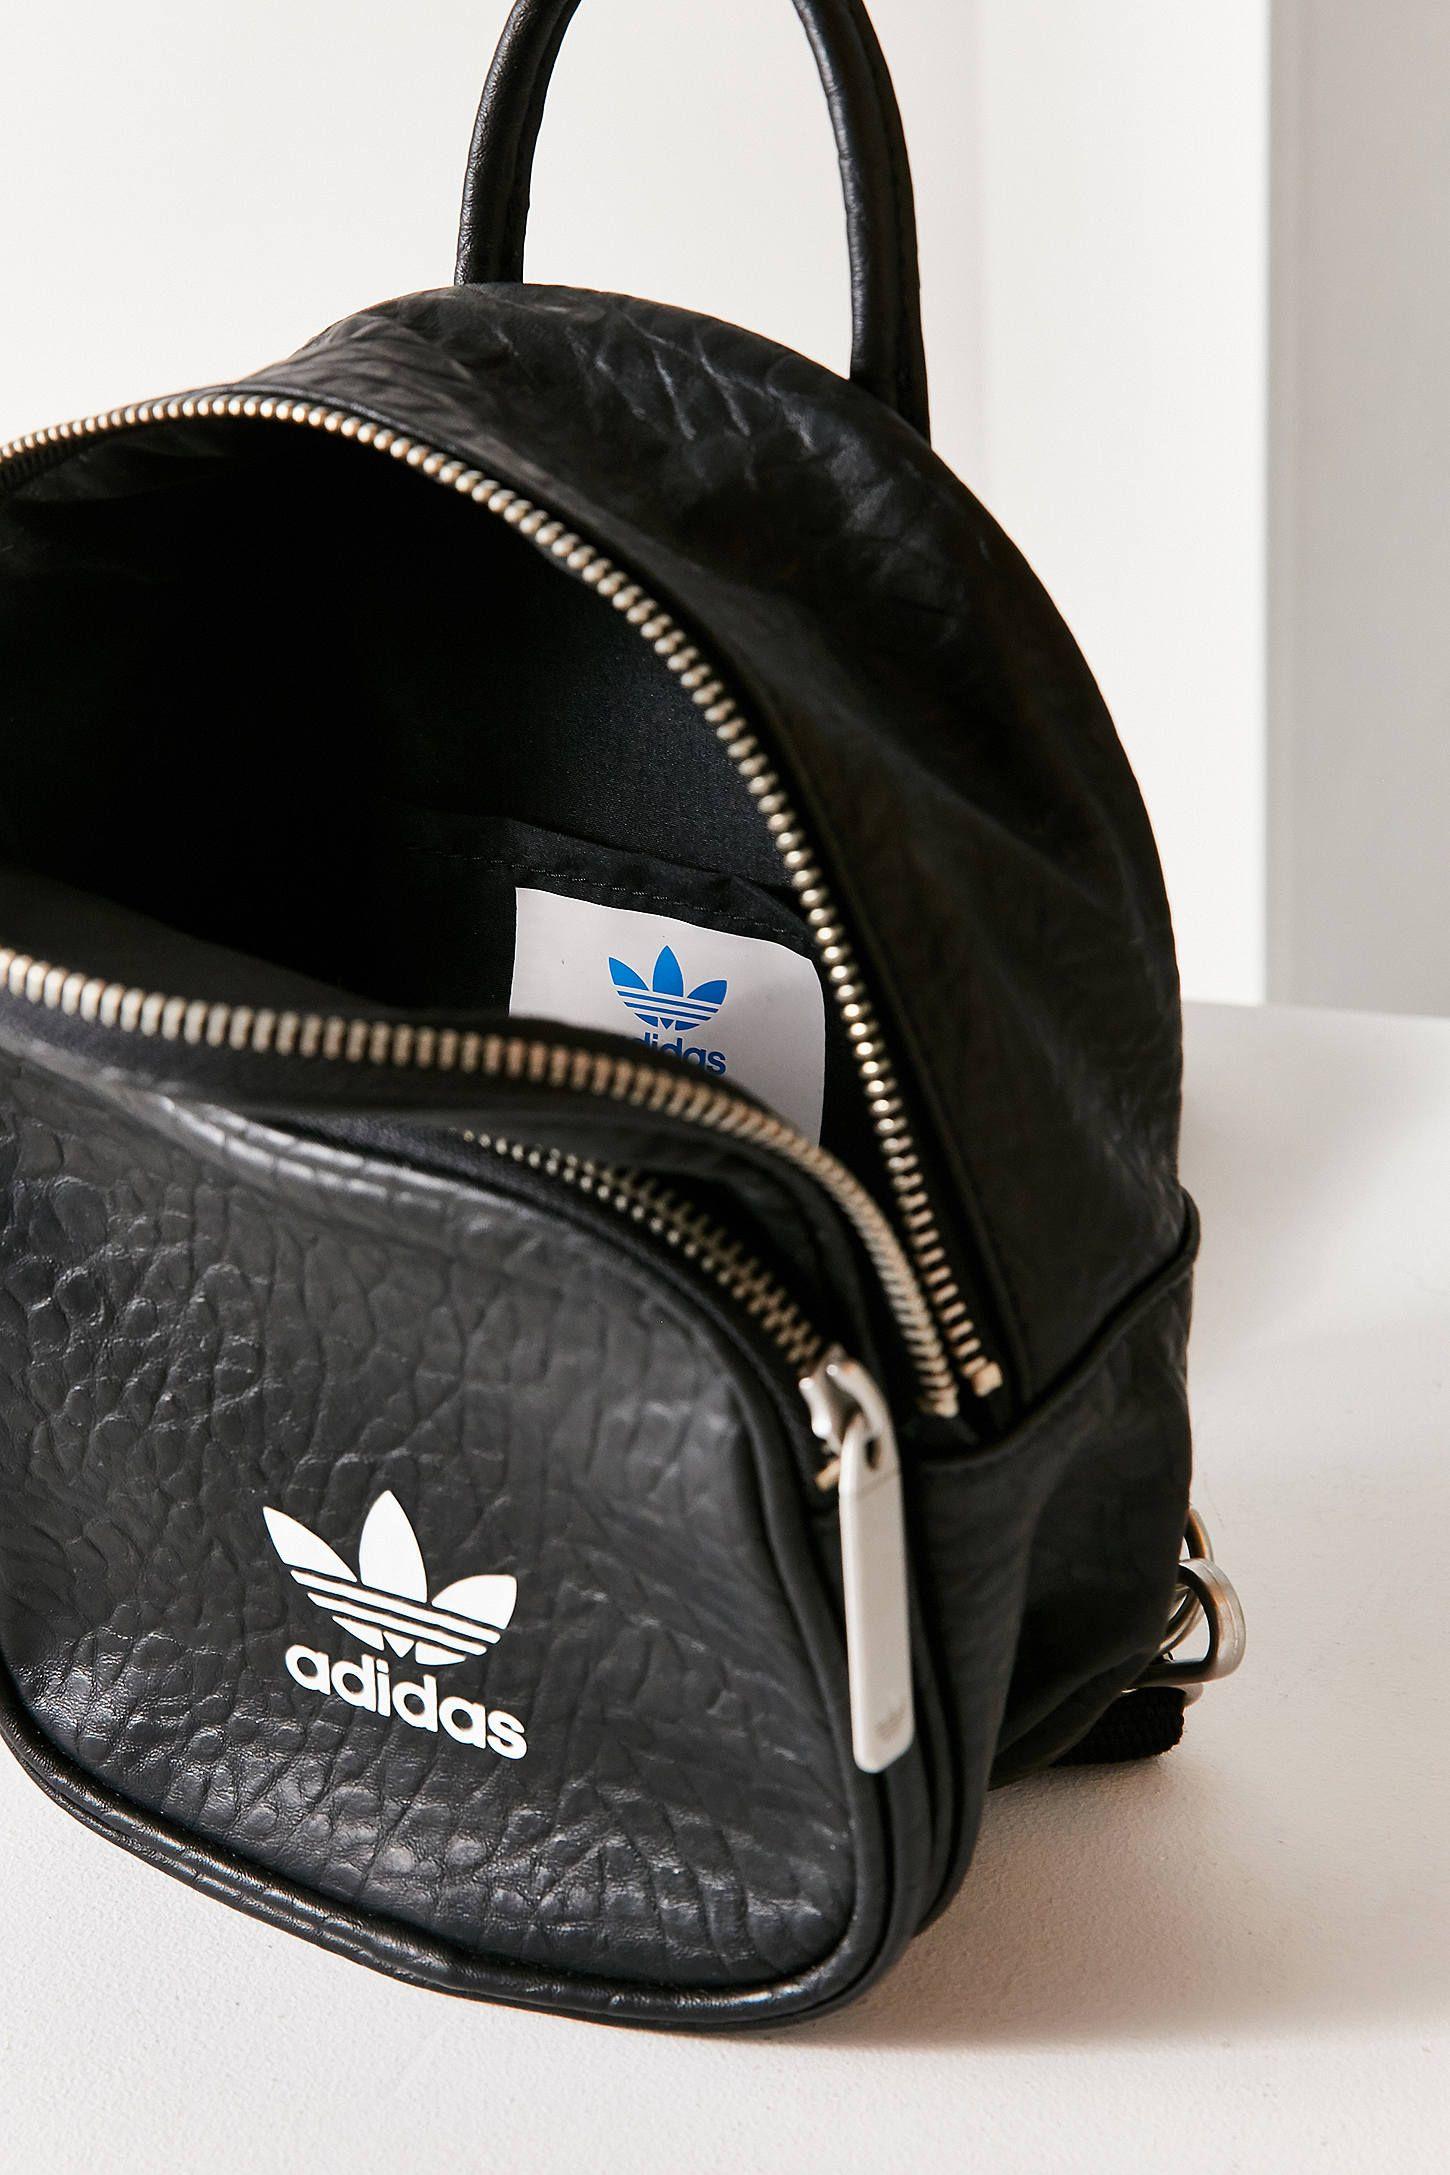 d2e595ad506 Adidas Classic Mini Backpack Pink- Fenix Toulouse Handball